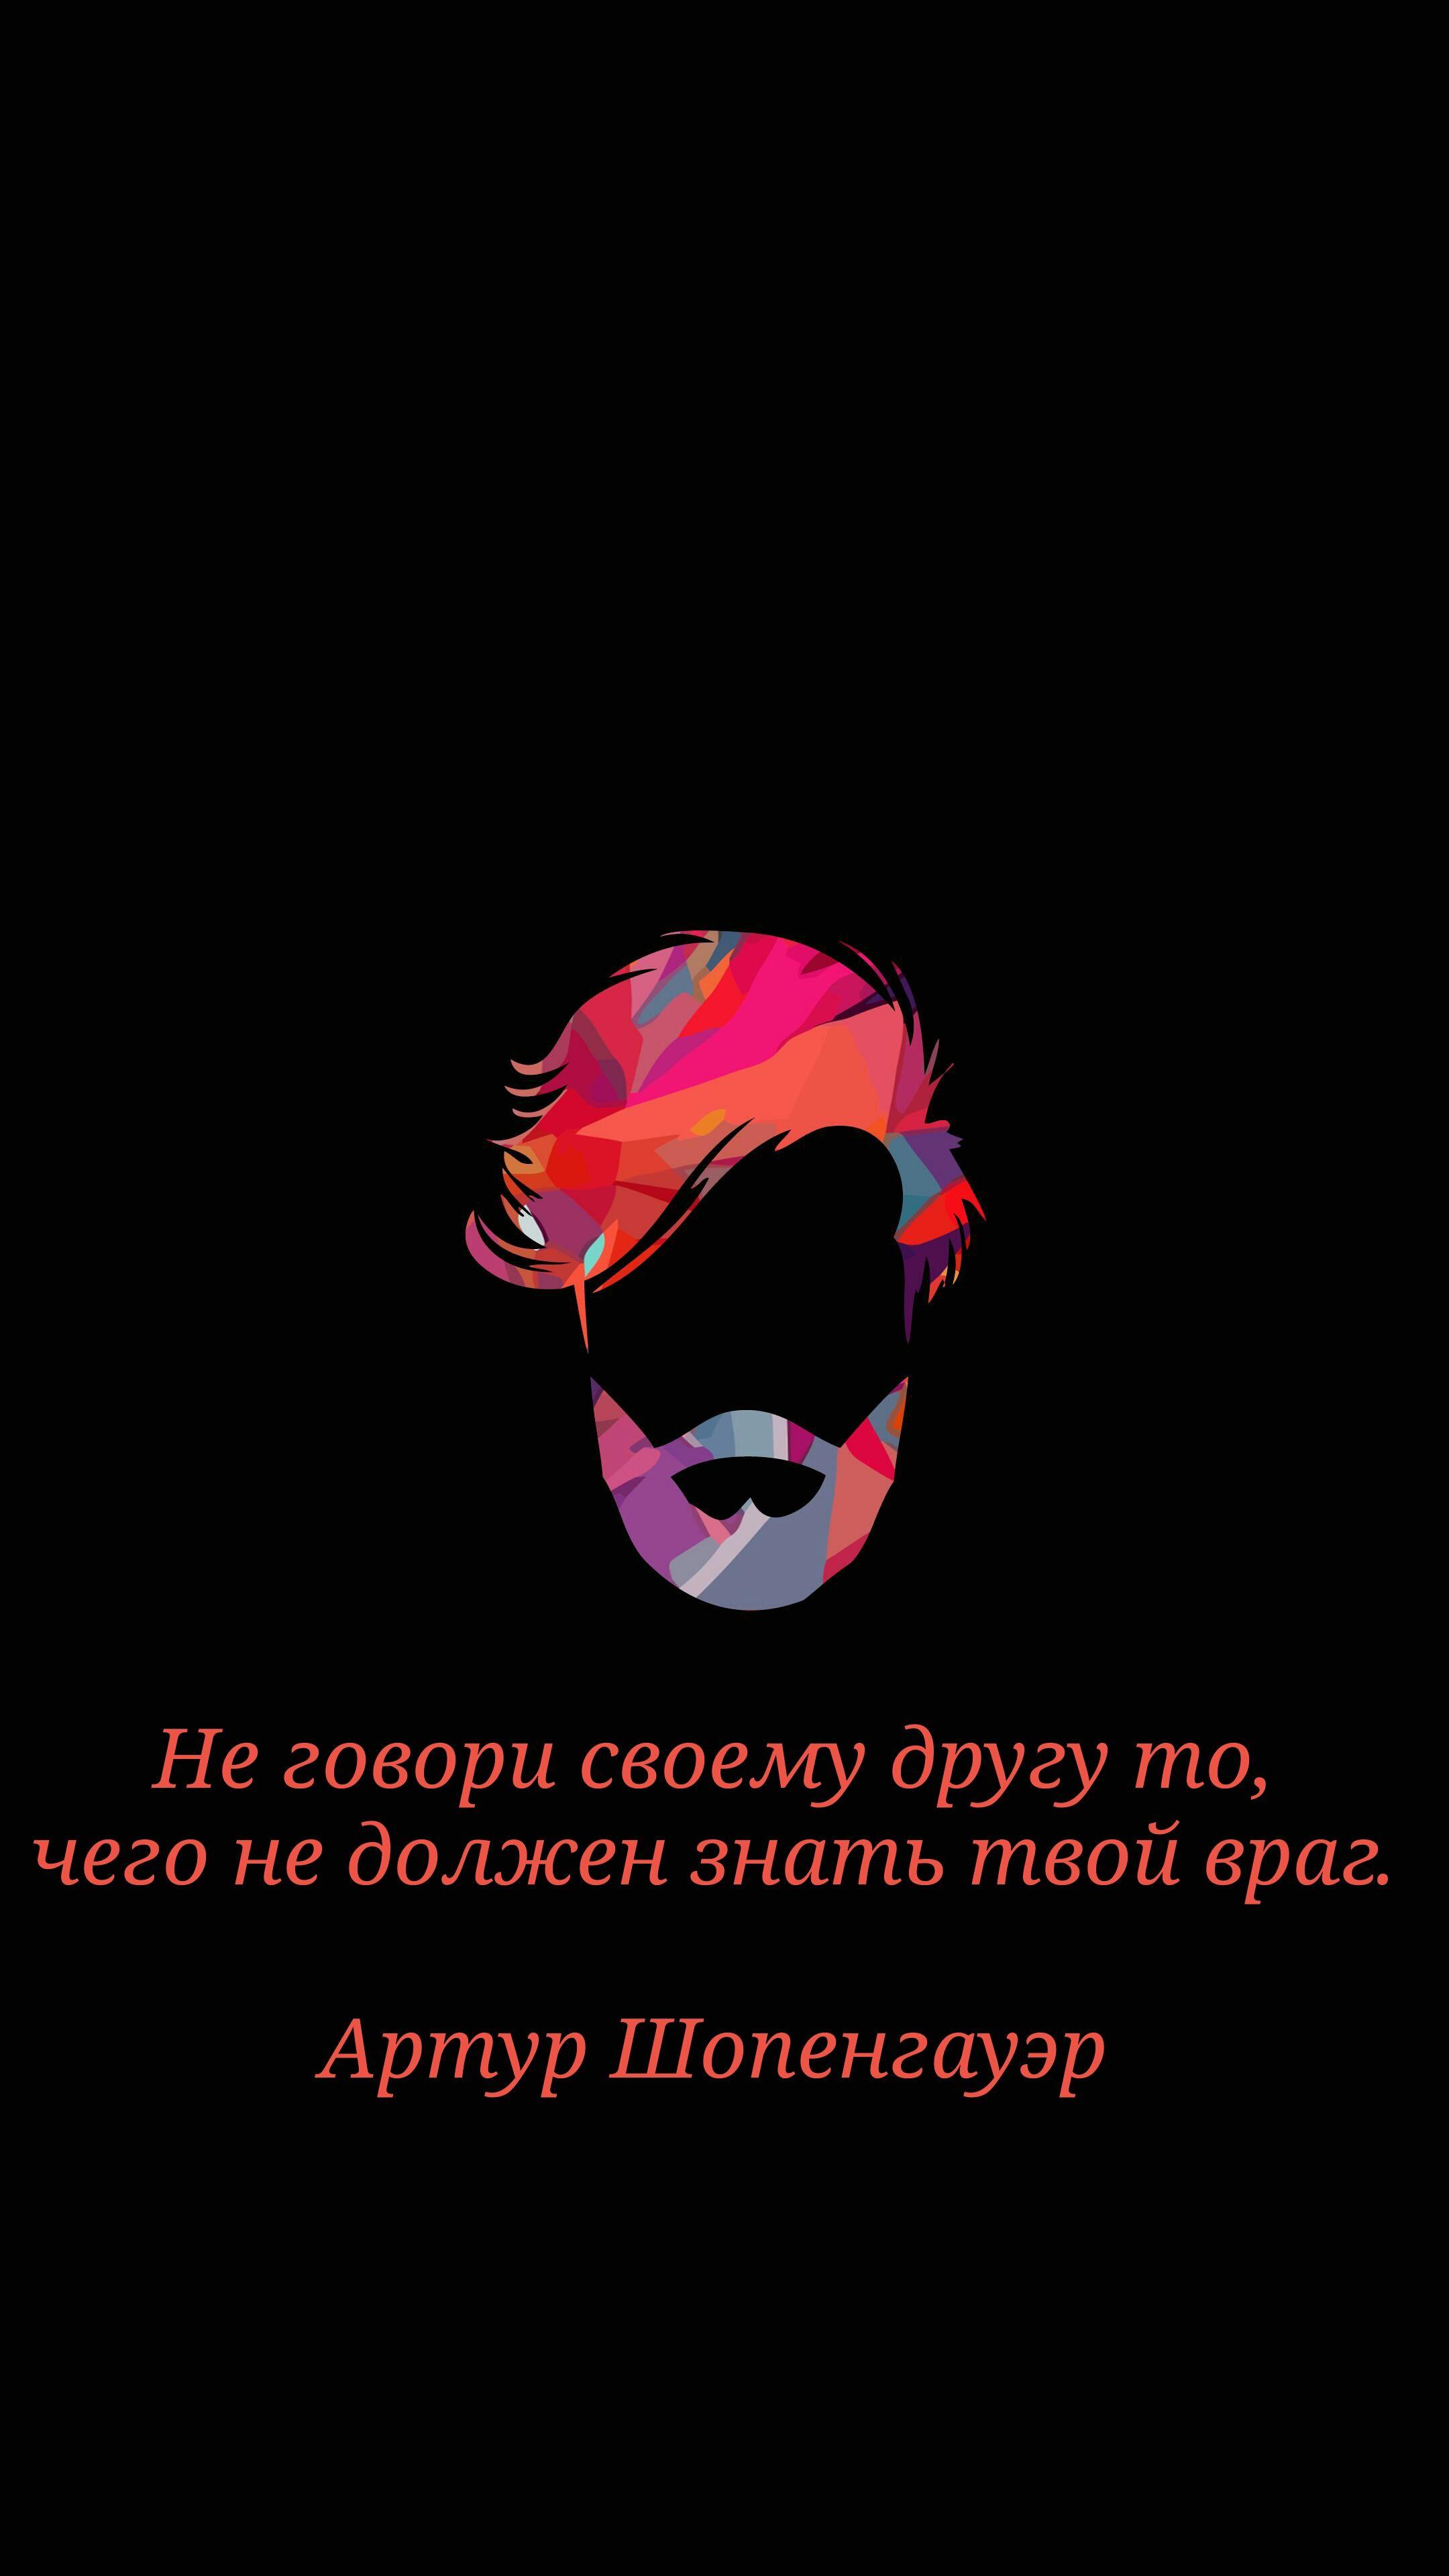 Image__878897_1499511991.jpg